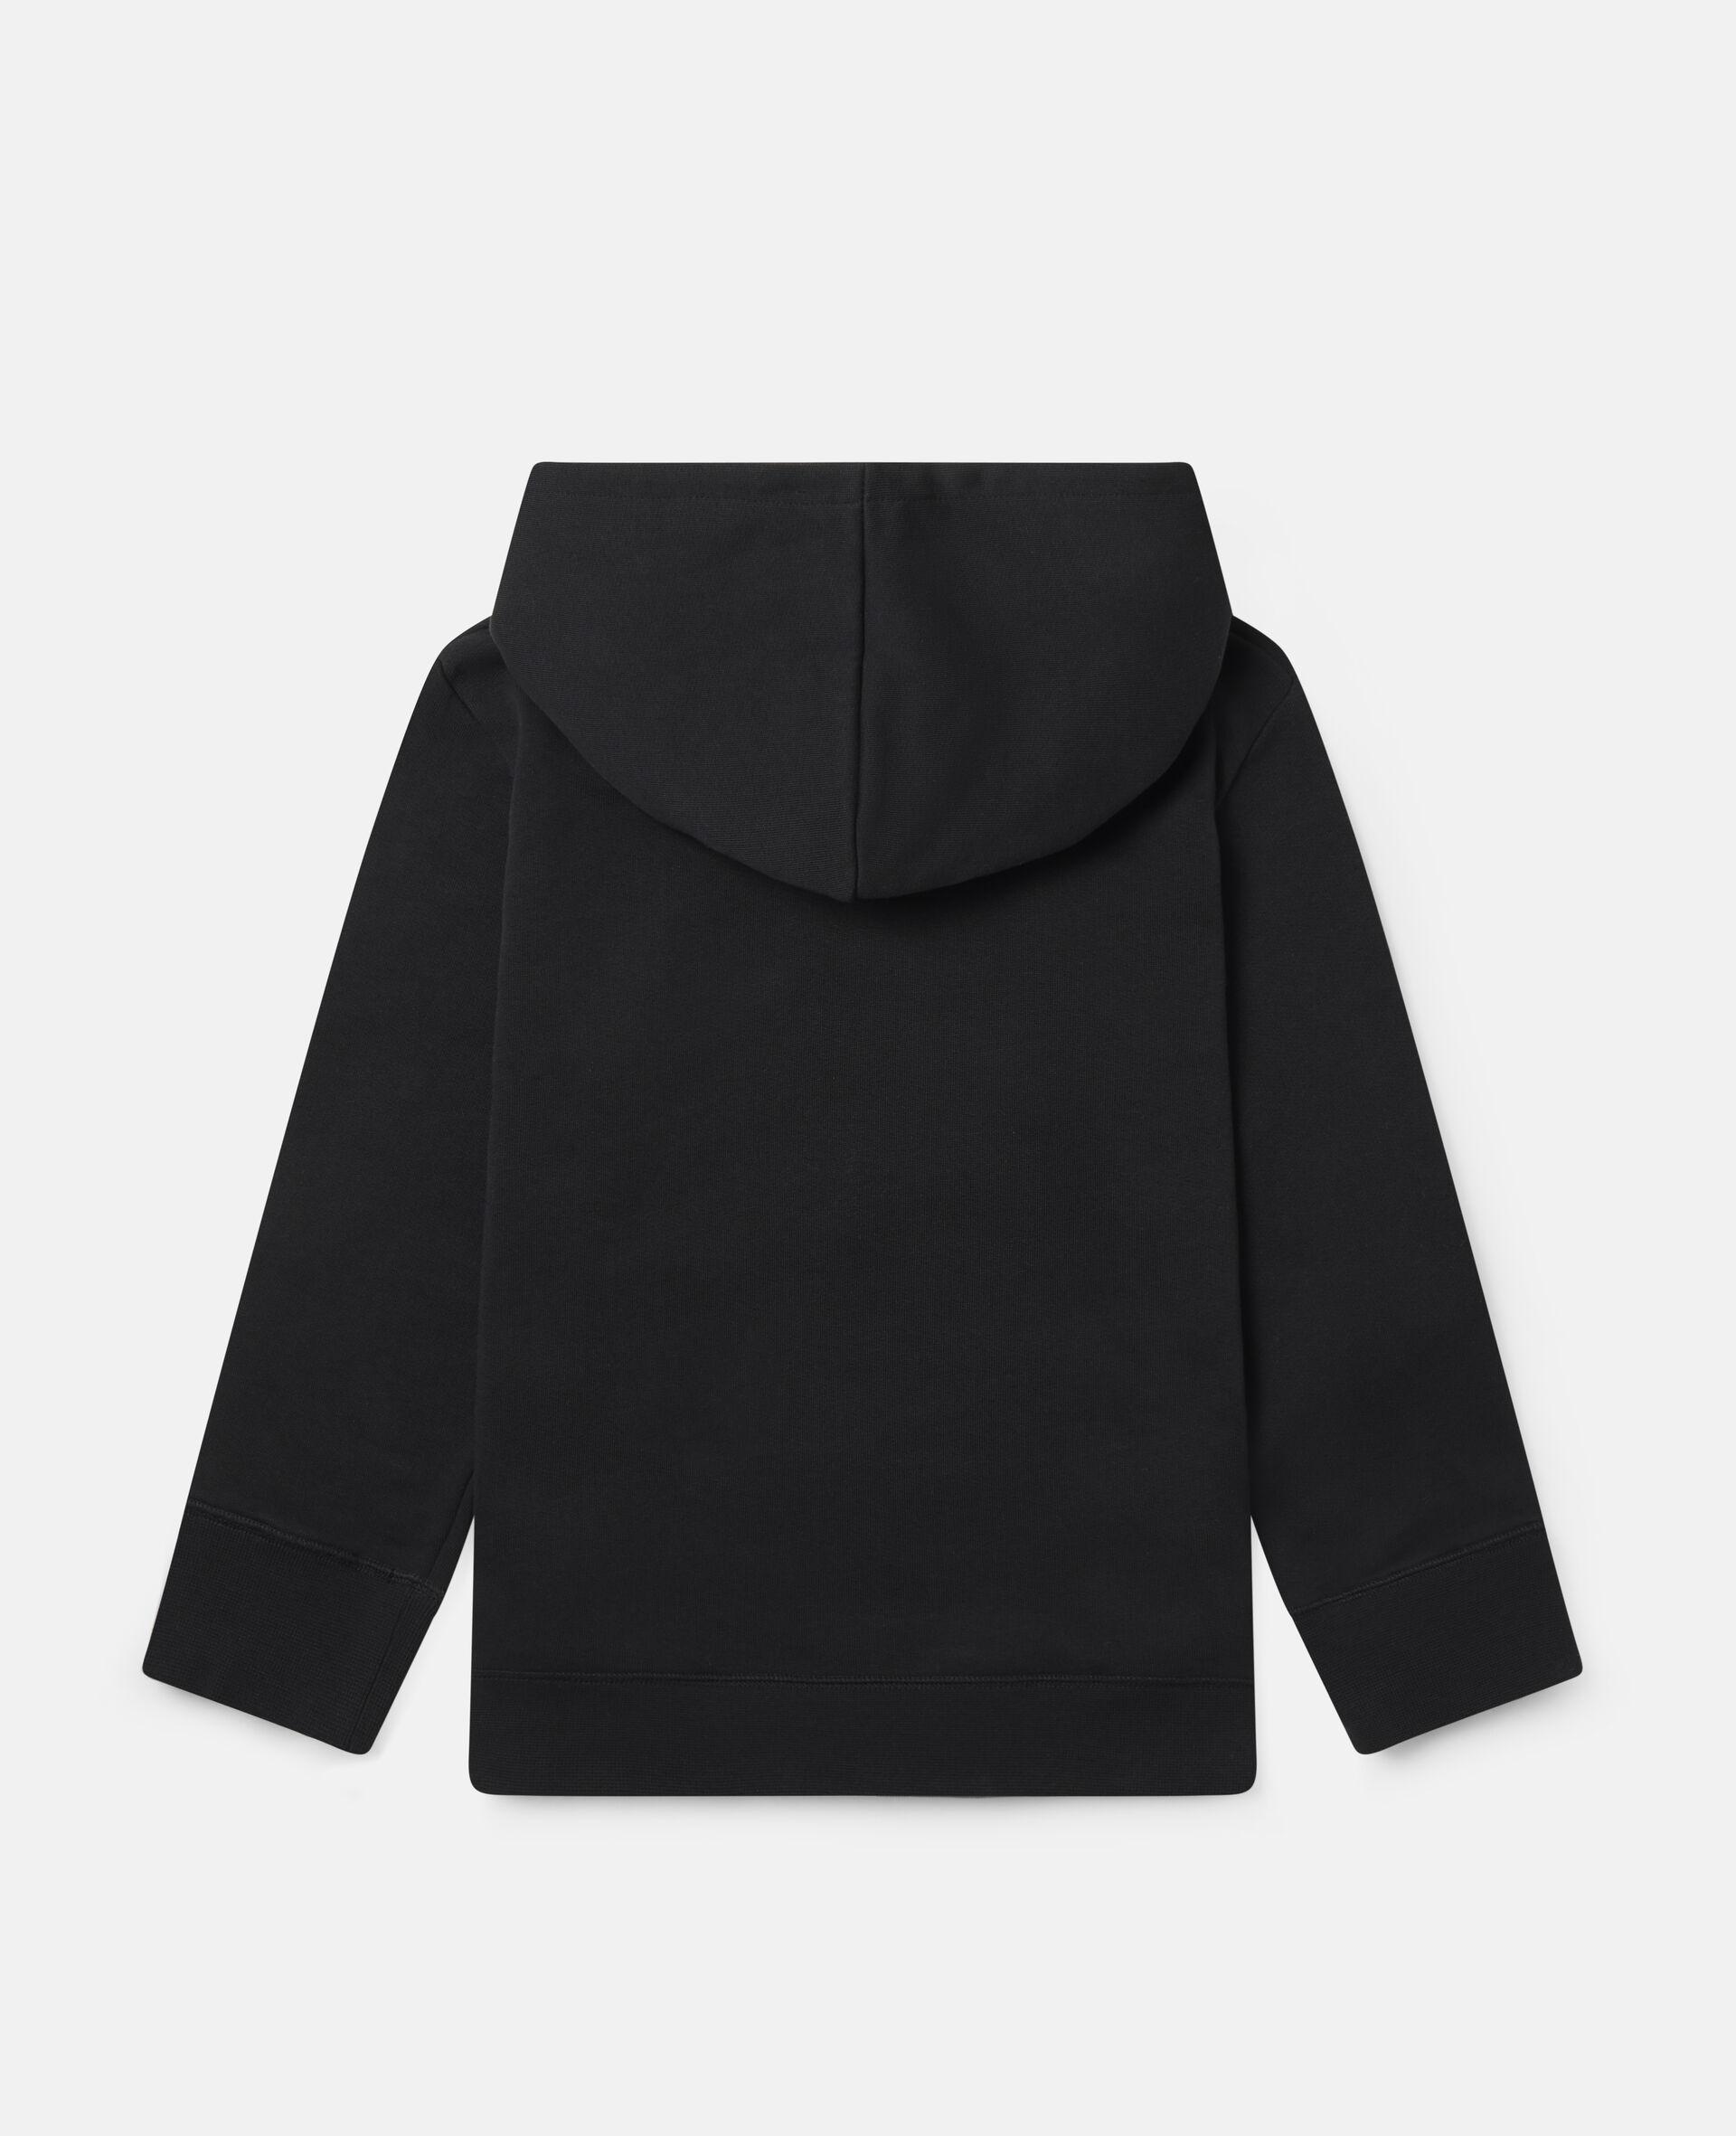 Oversized Graphic Mountain Fleece Hoodie-Black-large image number 3